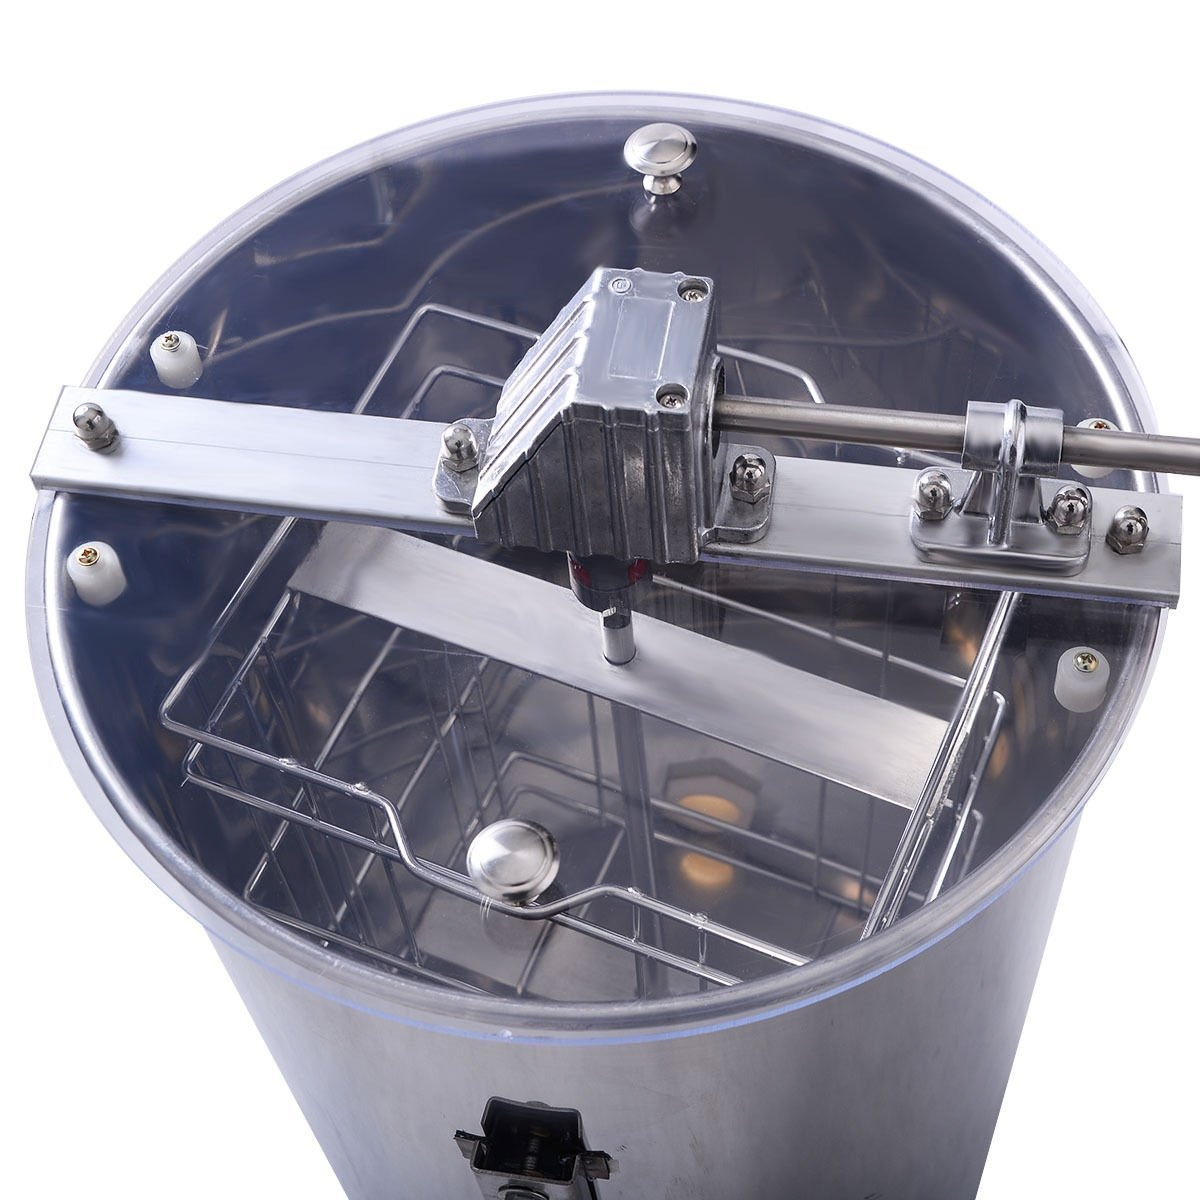 Goplus Grande 2 Encuadre Miel Extractor Apicultura Equipos D ...